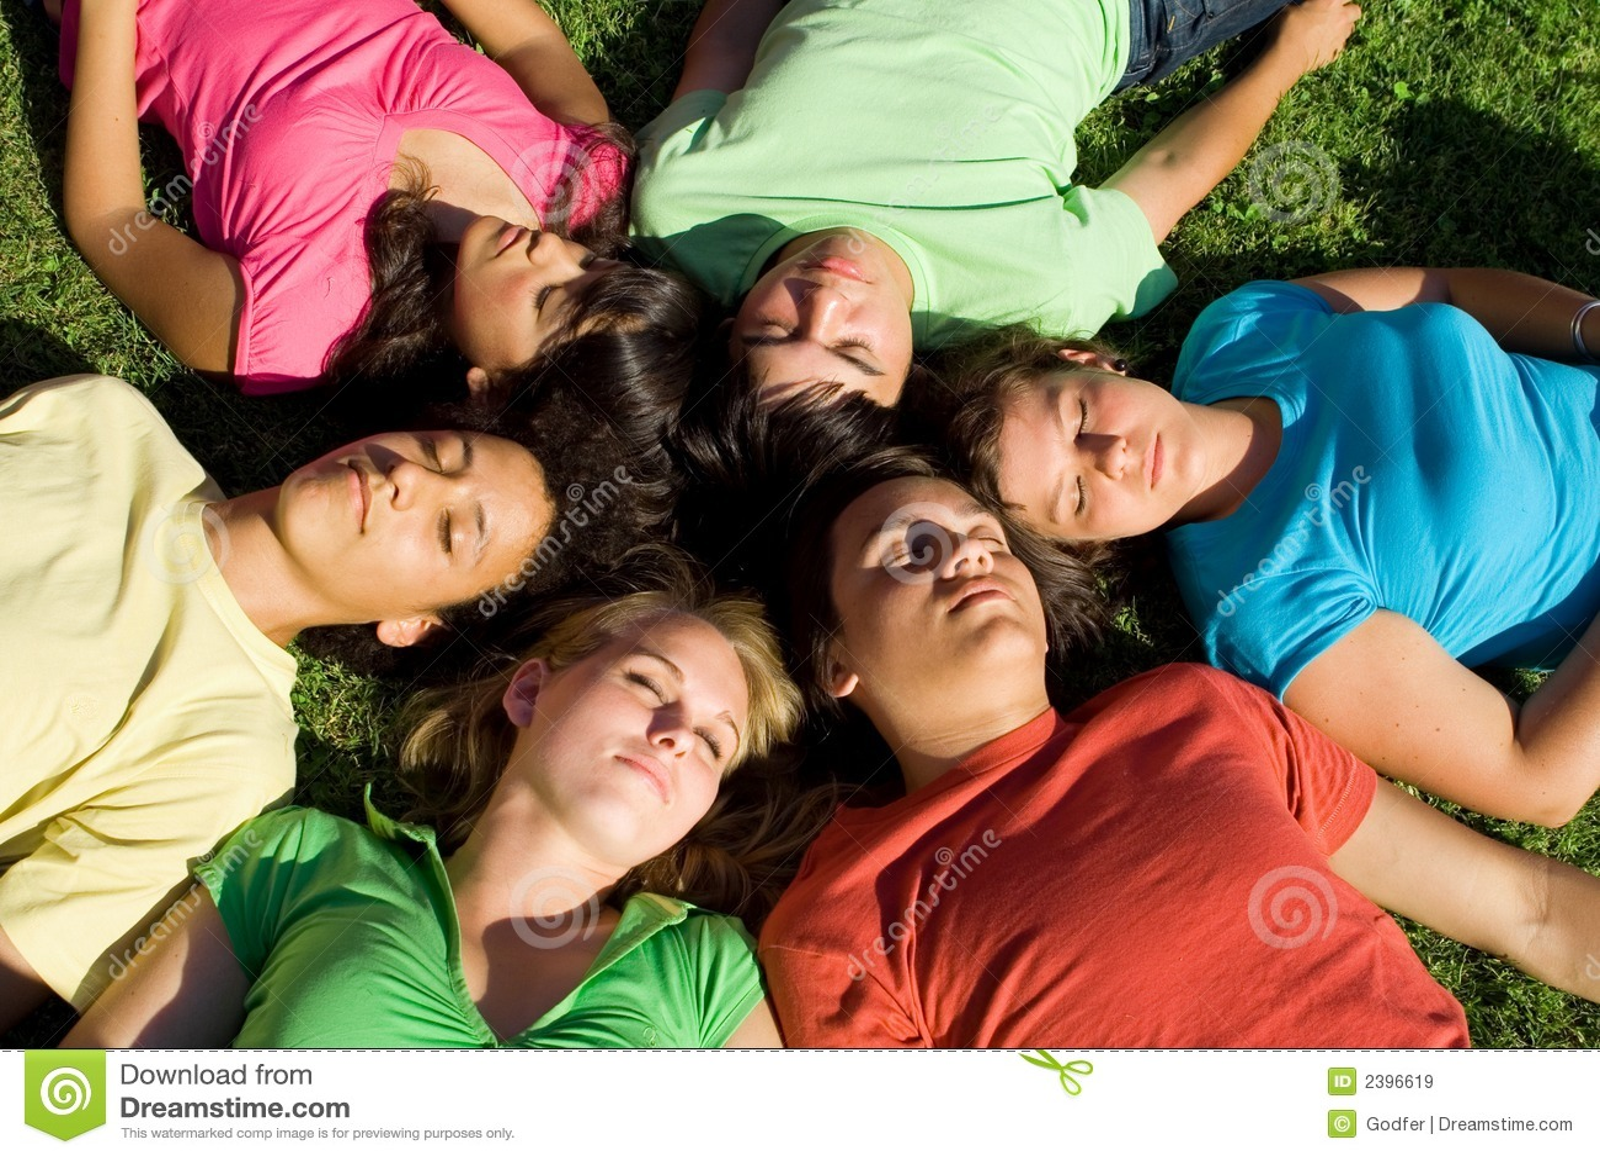 Adolescent sommeil com a